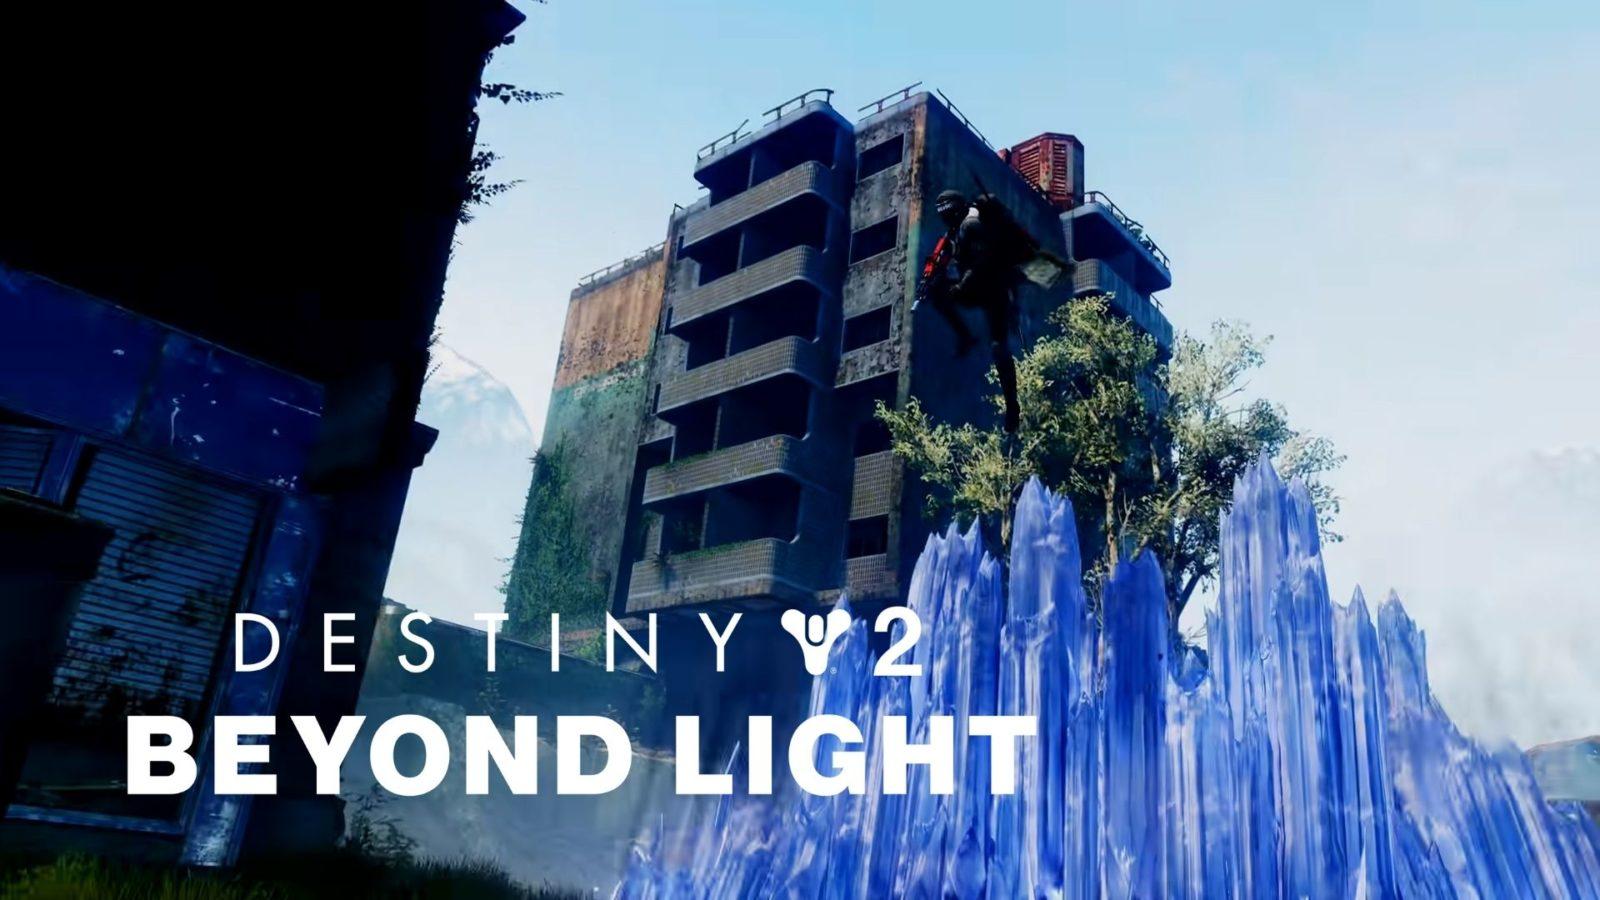 stasis aspects fragments in destiny 2 beyond light